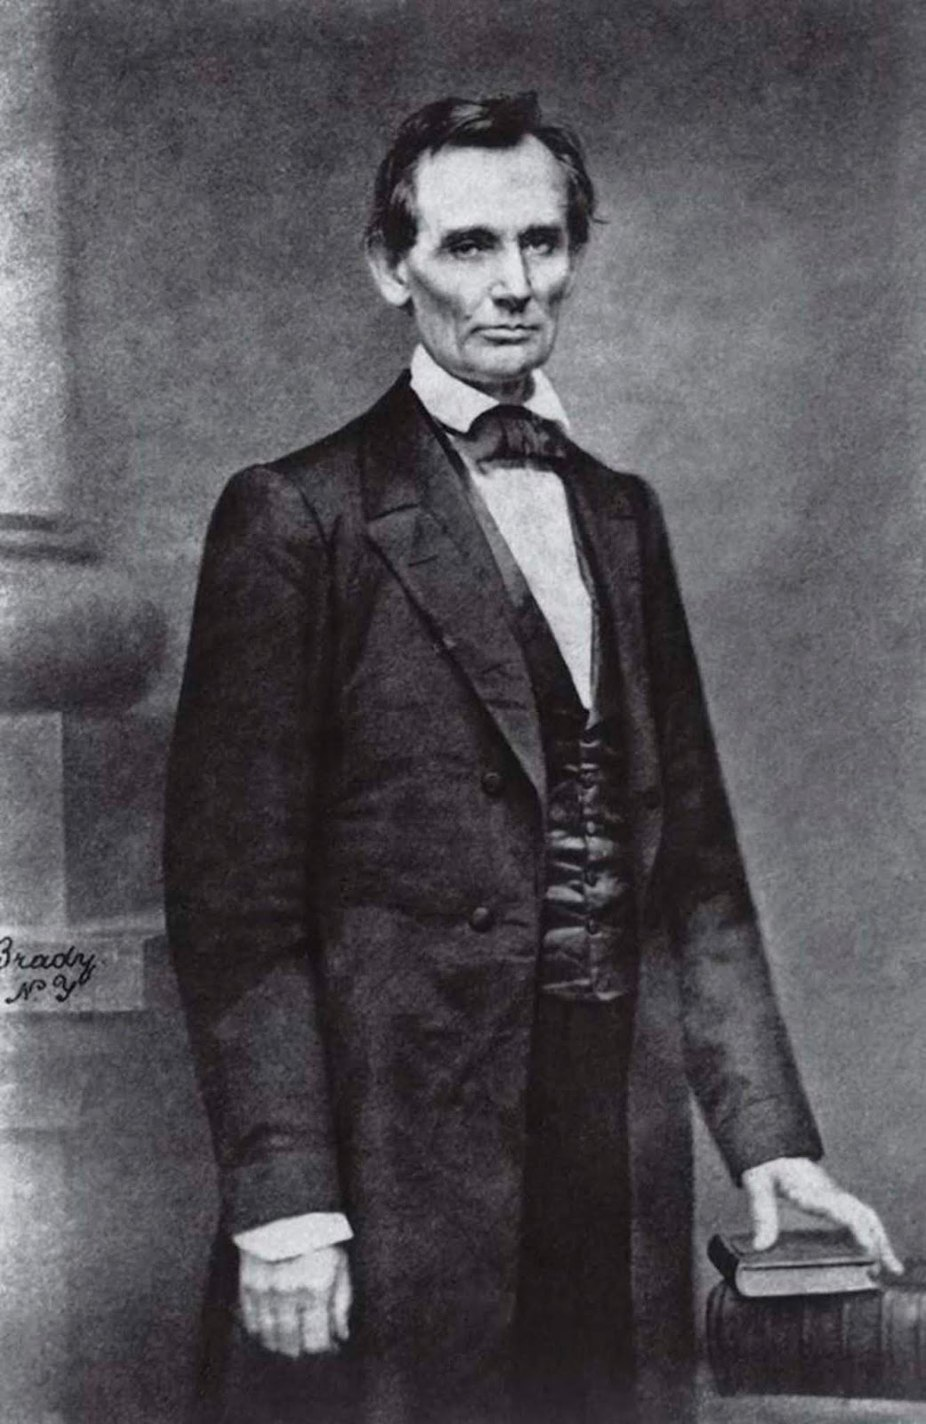 historical photos of Abraham Lincoln, Mathew B. Brady, 1860